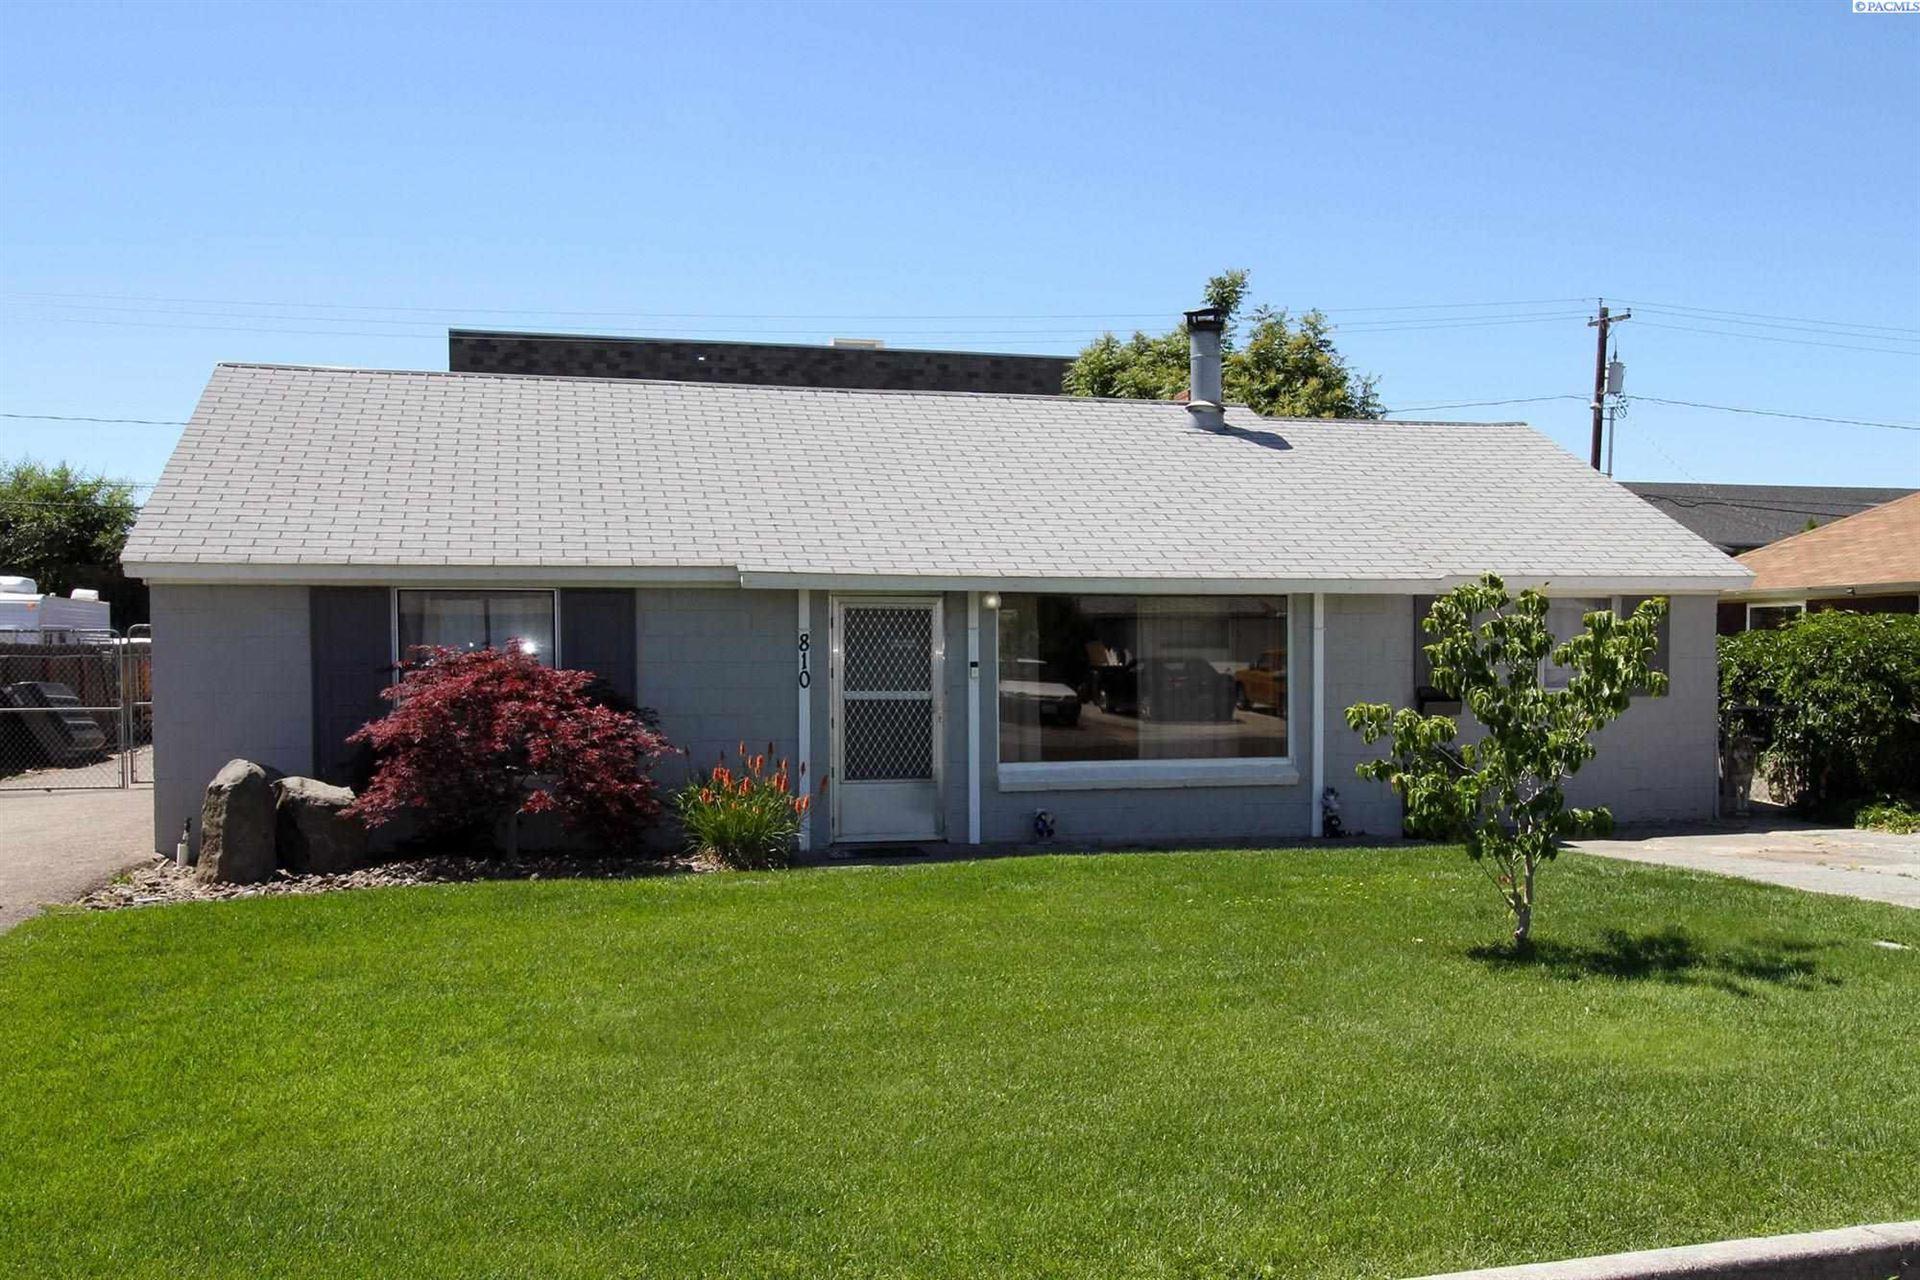 Photo of 810 S Ione St, Kennewick, WA 99336-5509 (MLS # 254362)